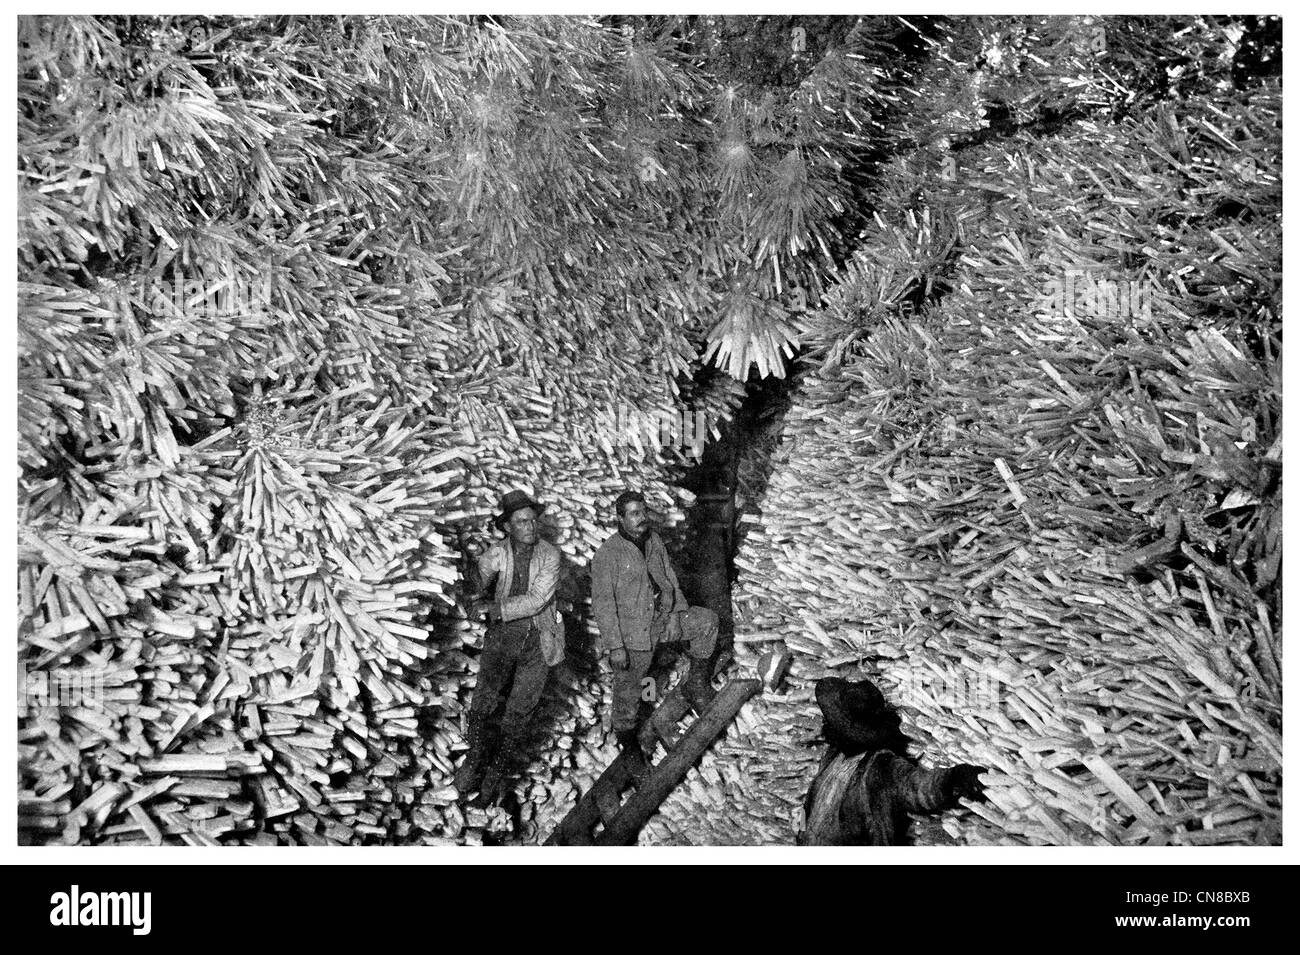 First published 1914 Coalcite Crystal Caves at Naica mine Santa Rosalia Chihuahua - Stock Image